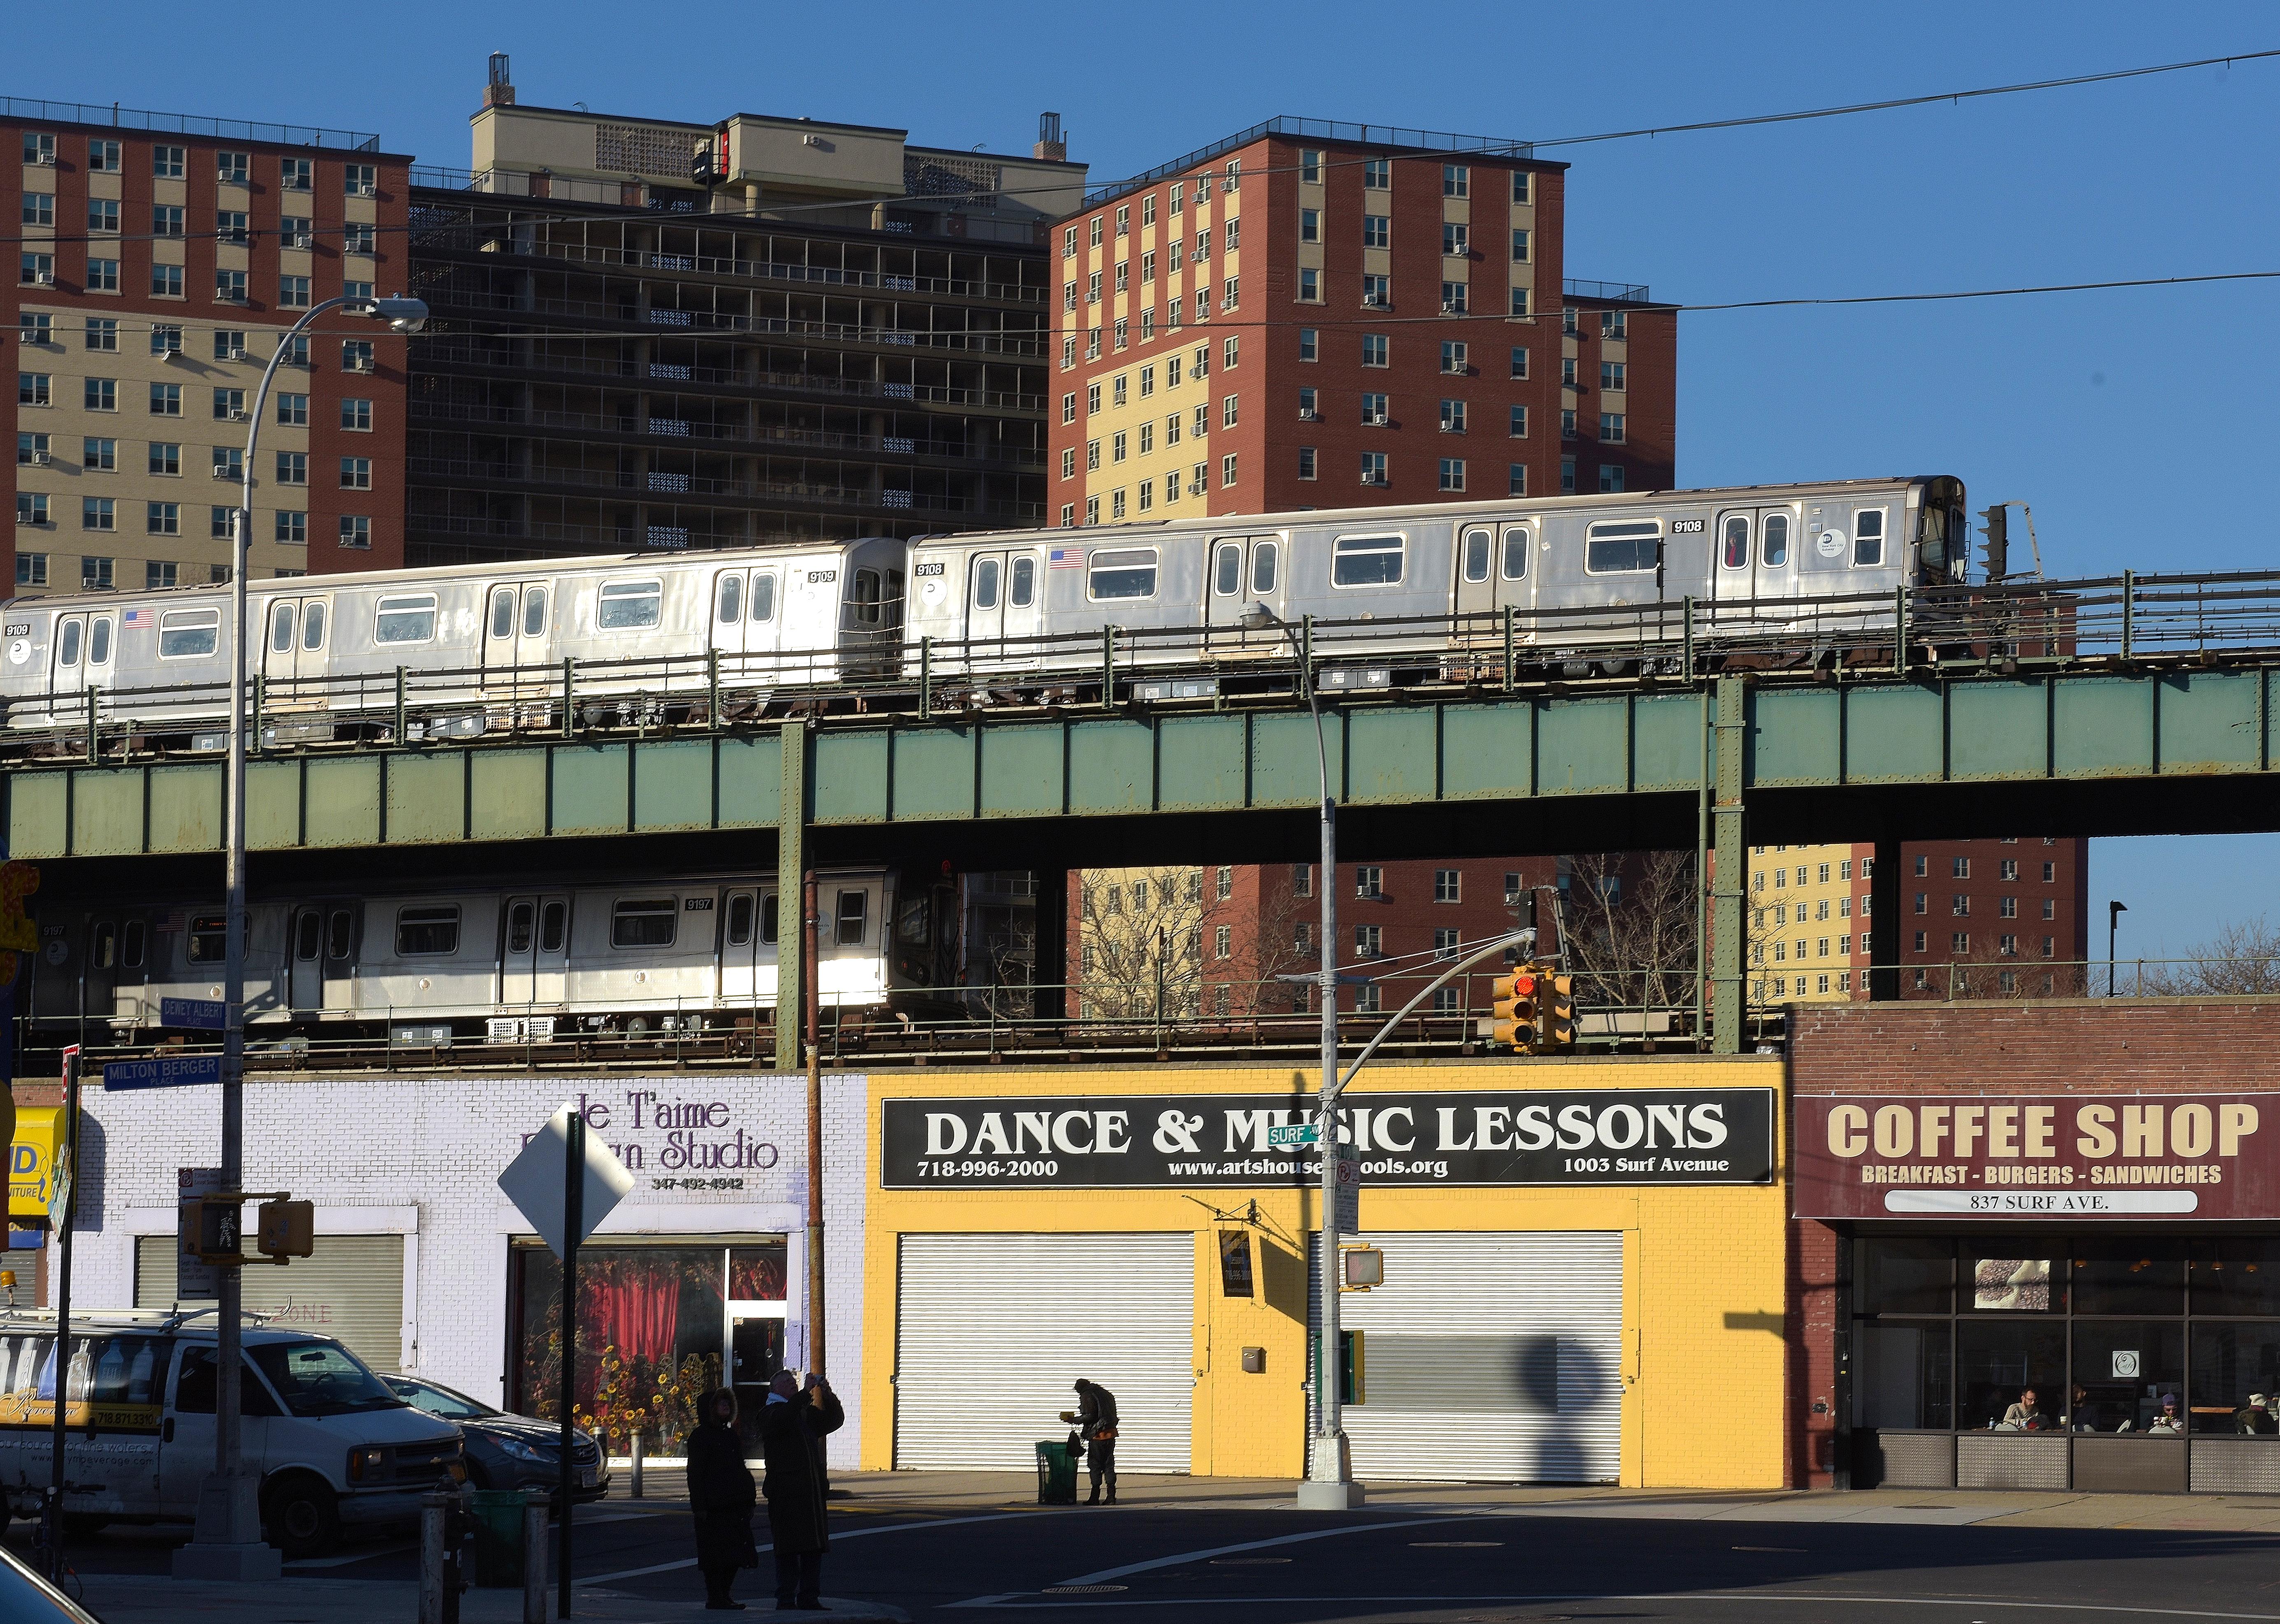 New York City Subway stations